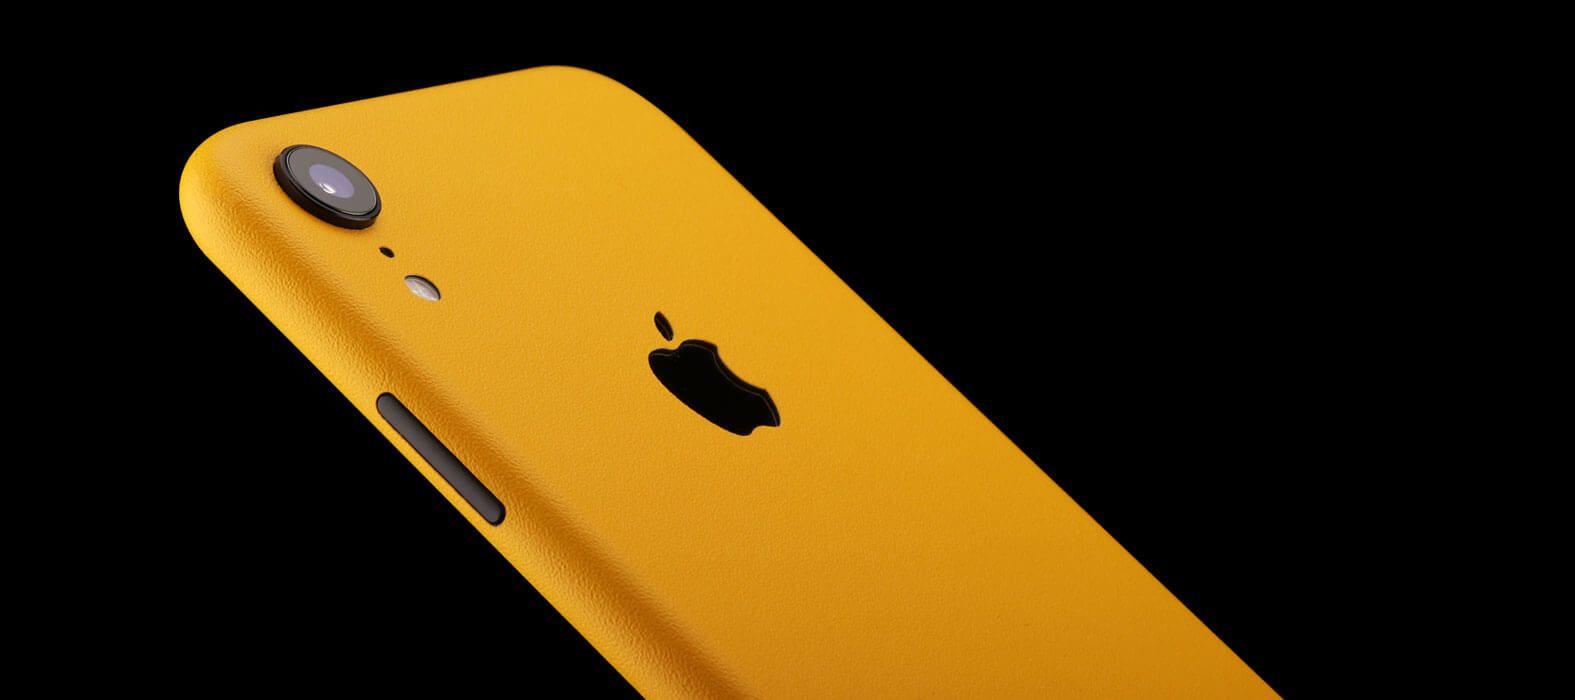 iphone-xr--sandstone-yellow_skins